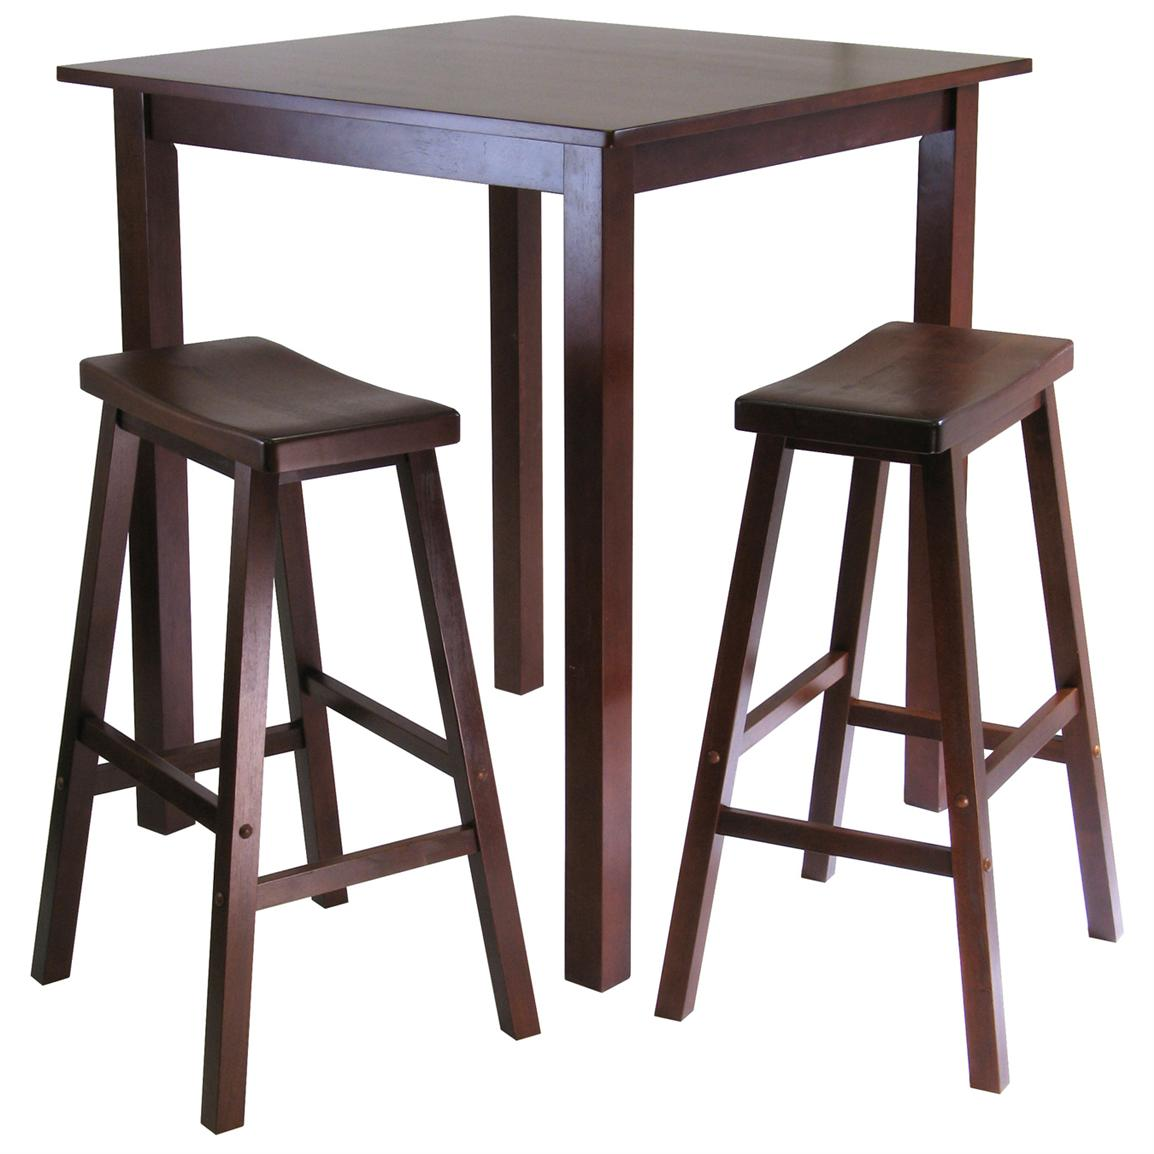 Pub Tables and Stools